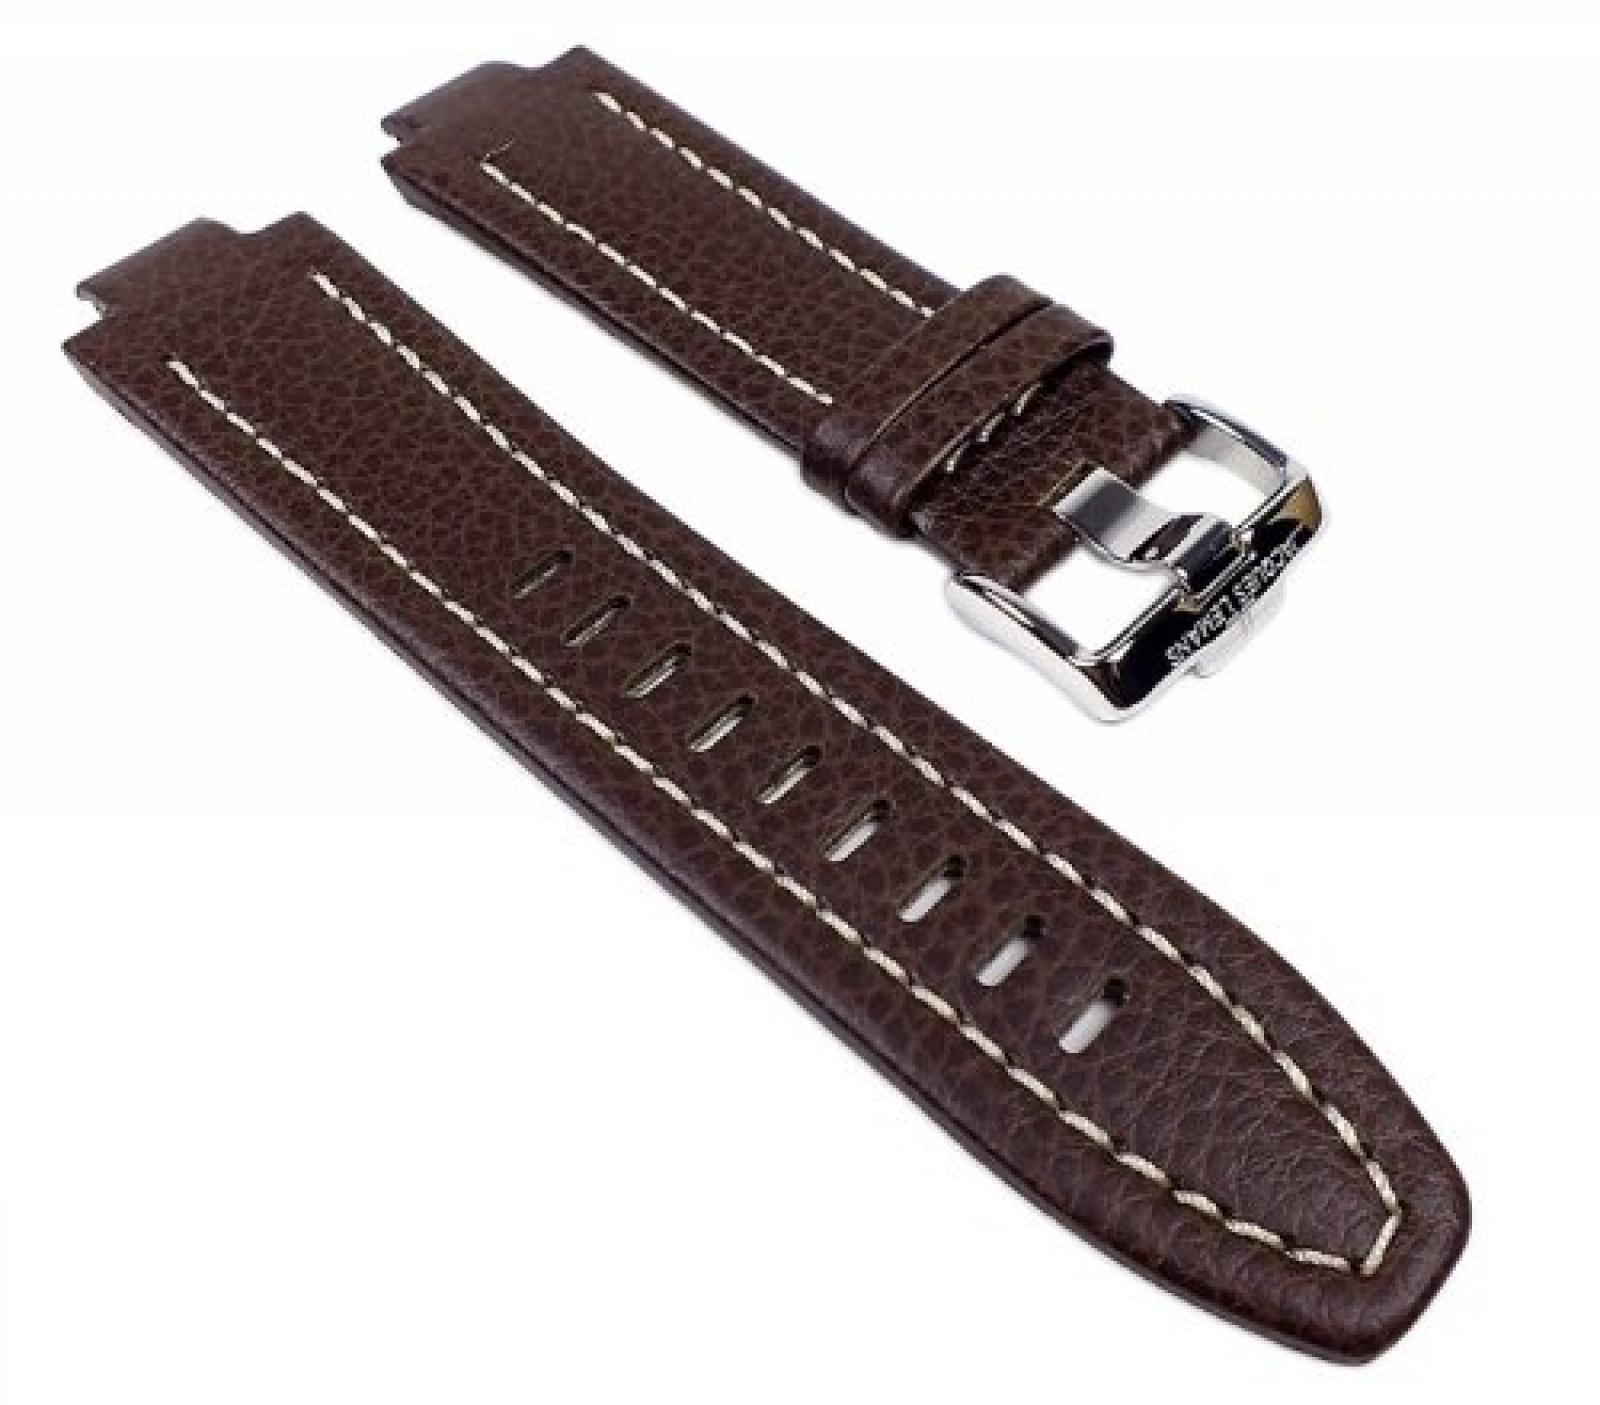 Jacques Lemans Power Chrono Ersatzband Uhrarmband Leder Braun 13mm für JL1-1485